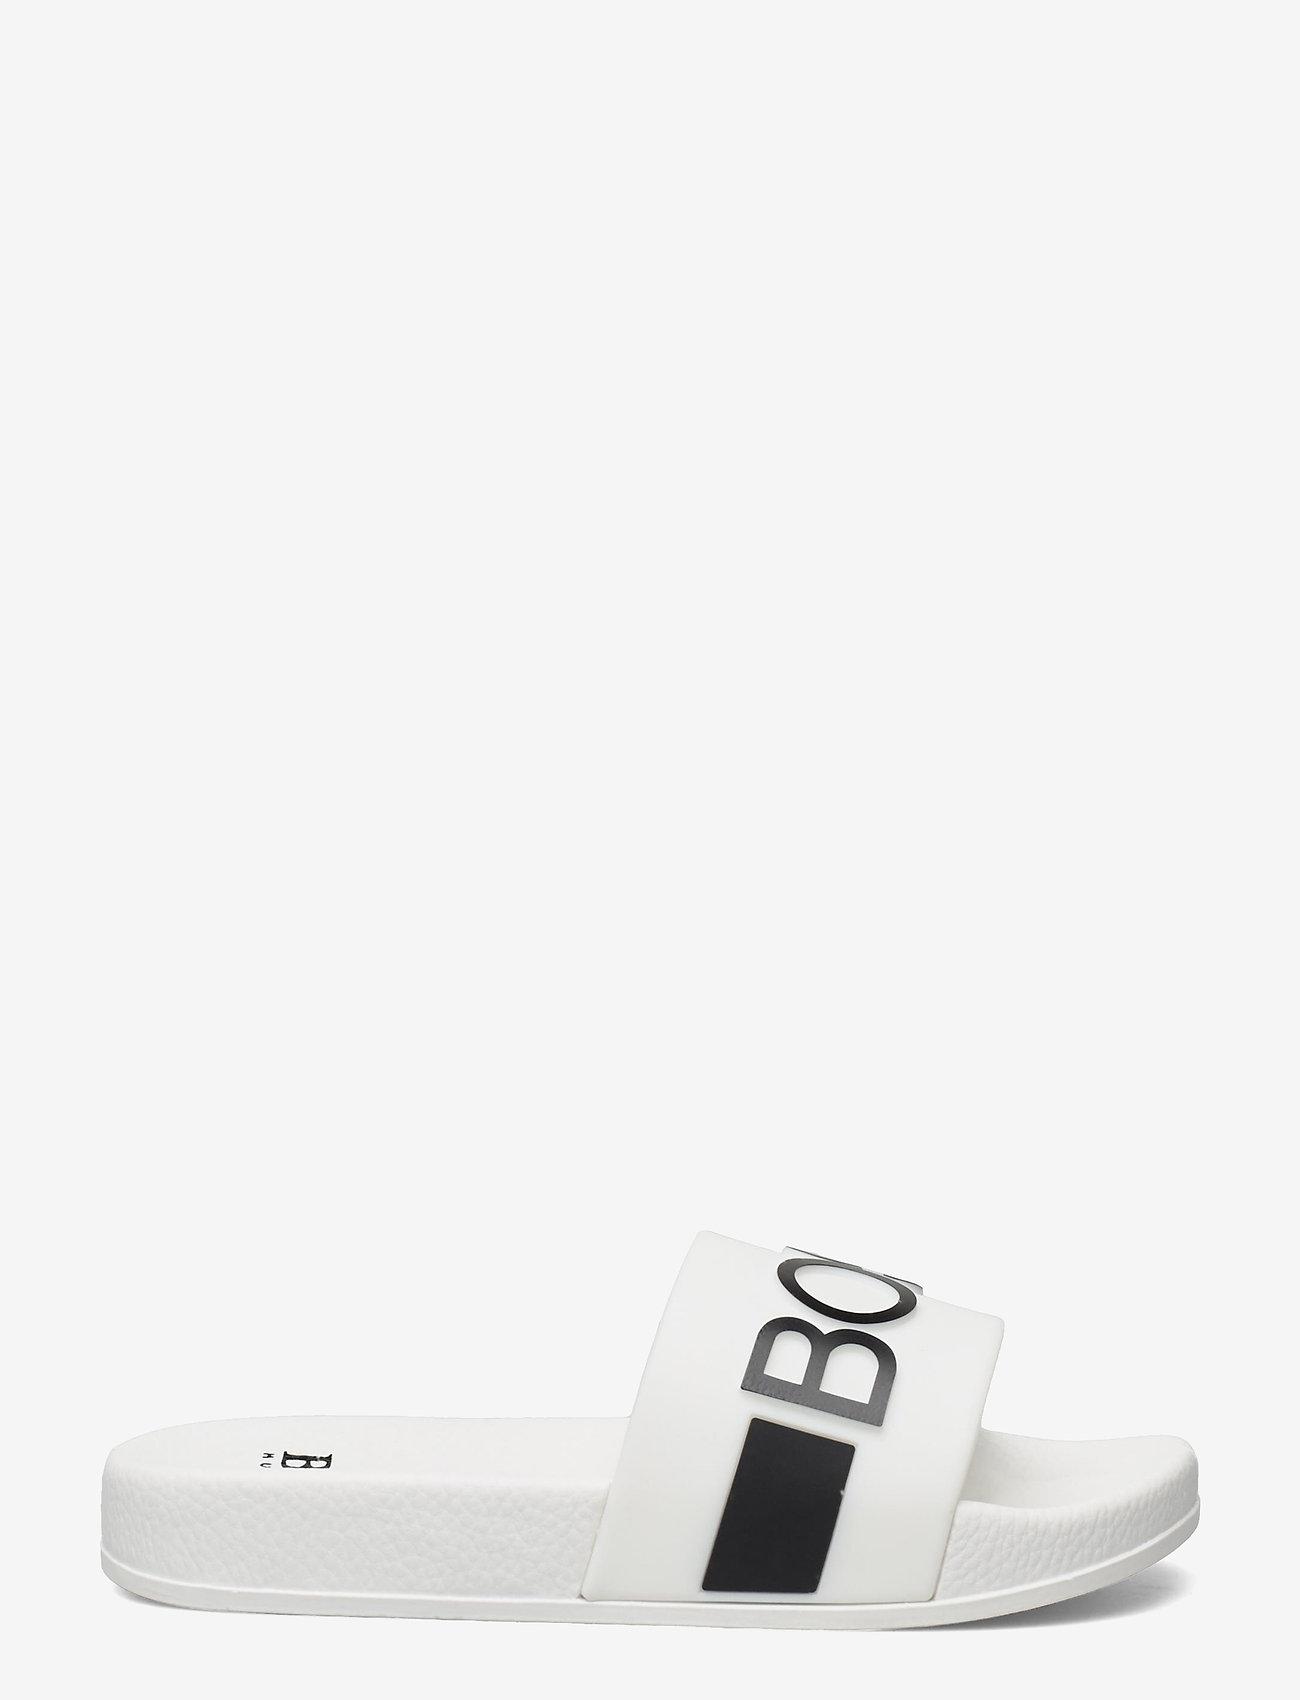 BOSS - SANDALS - schuhe - white - 1